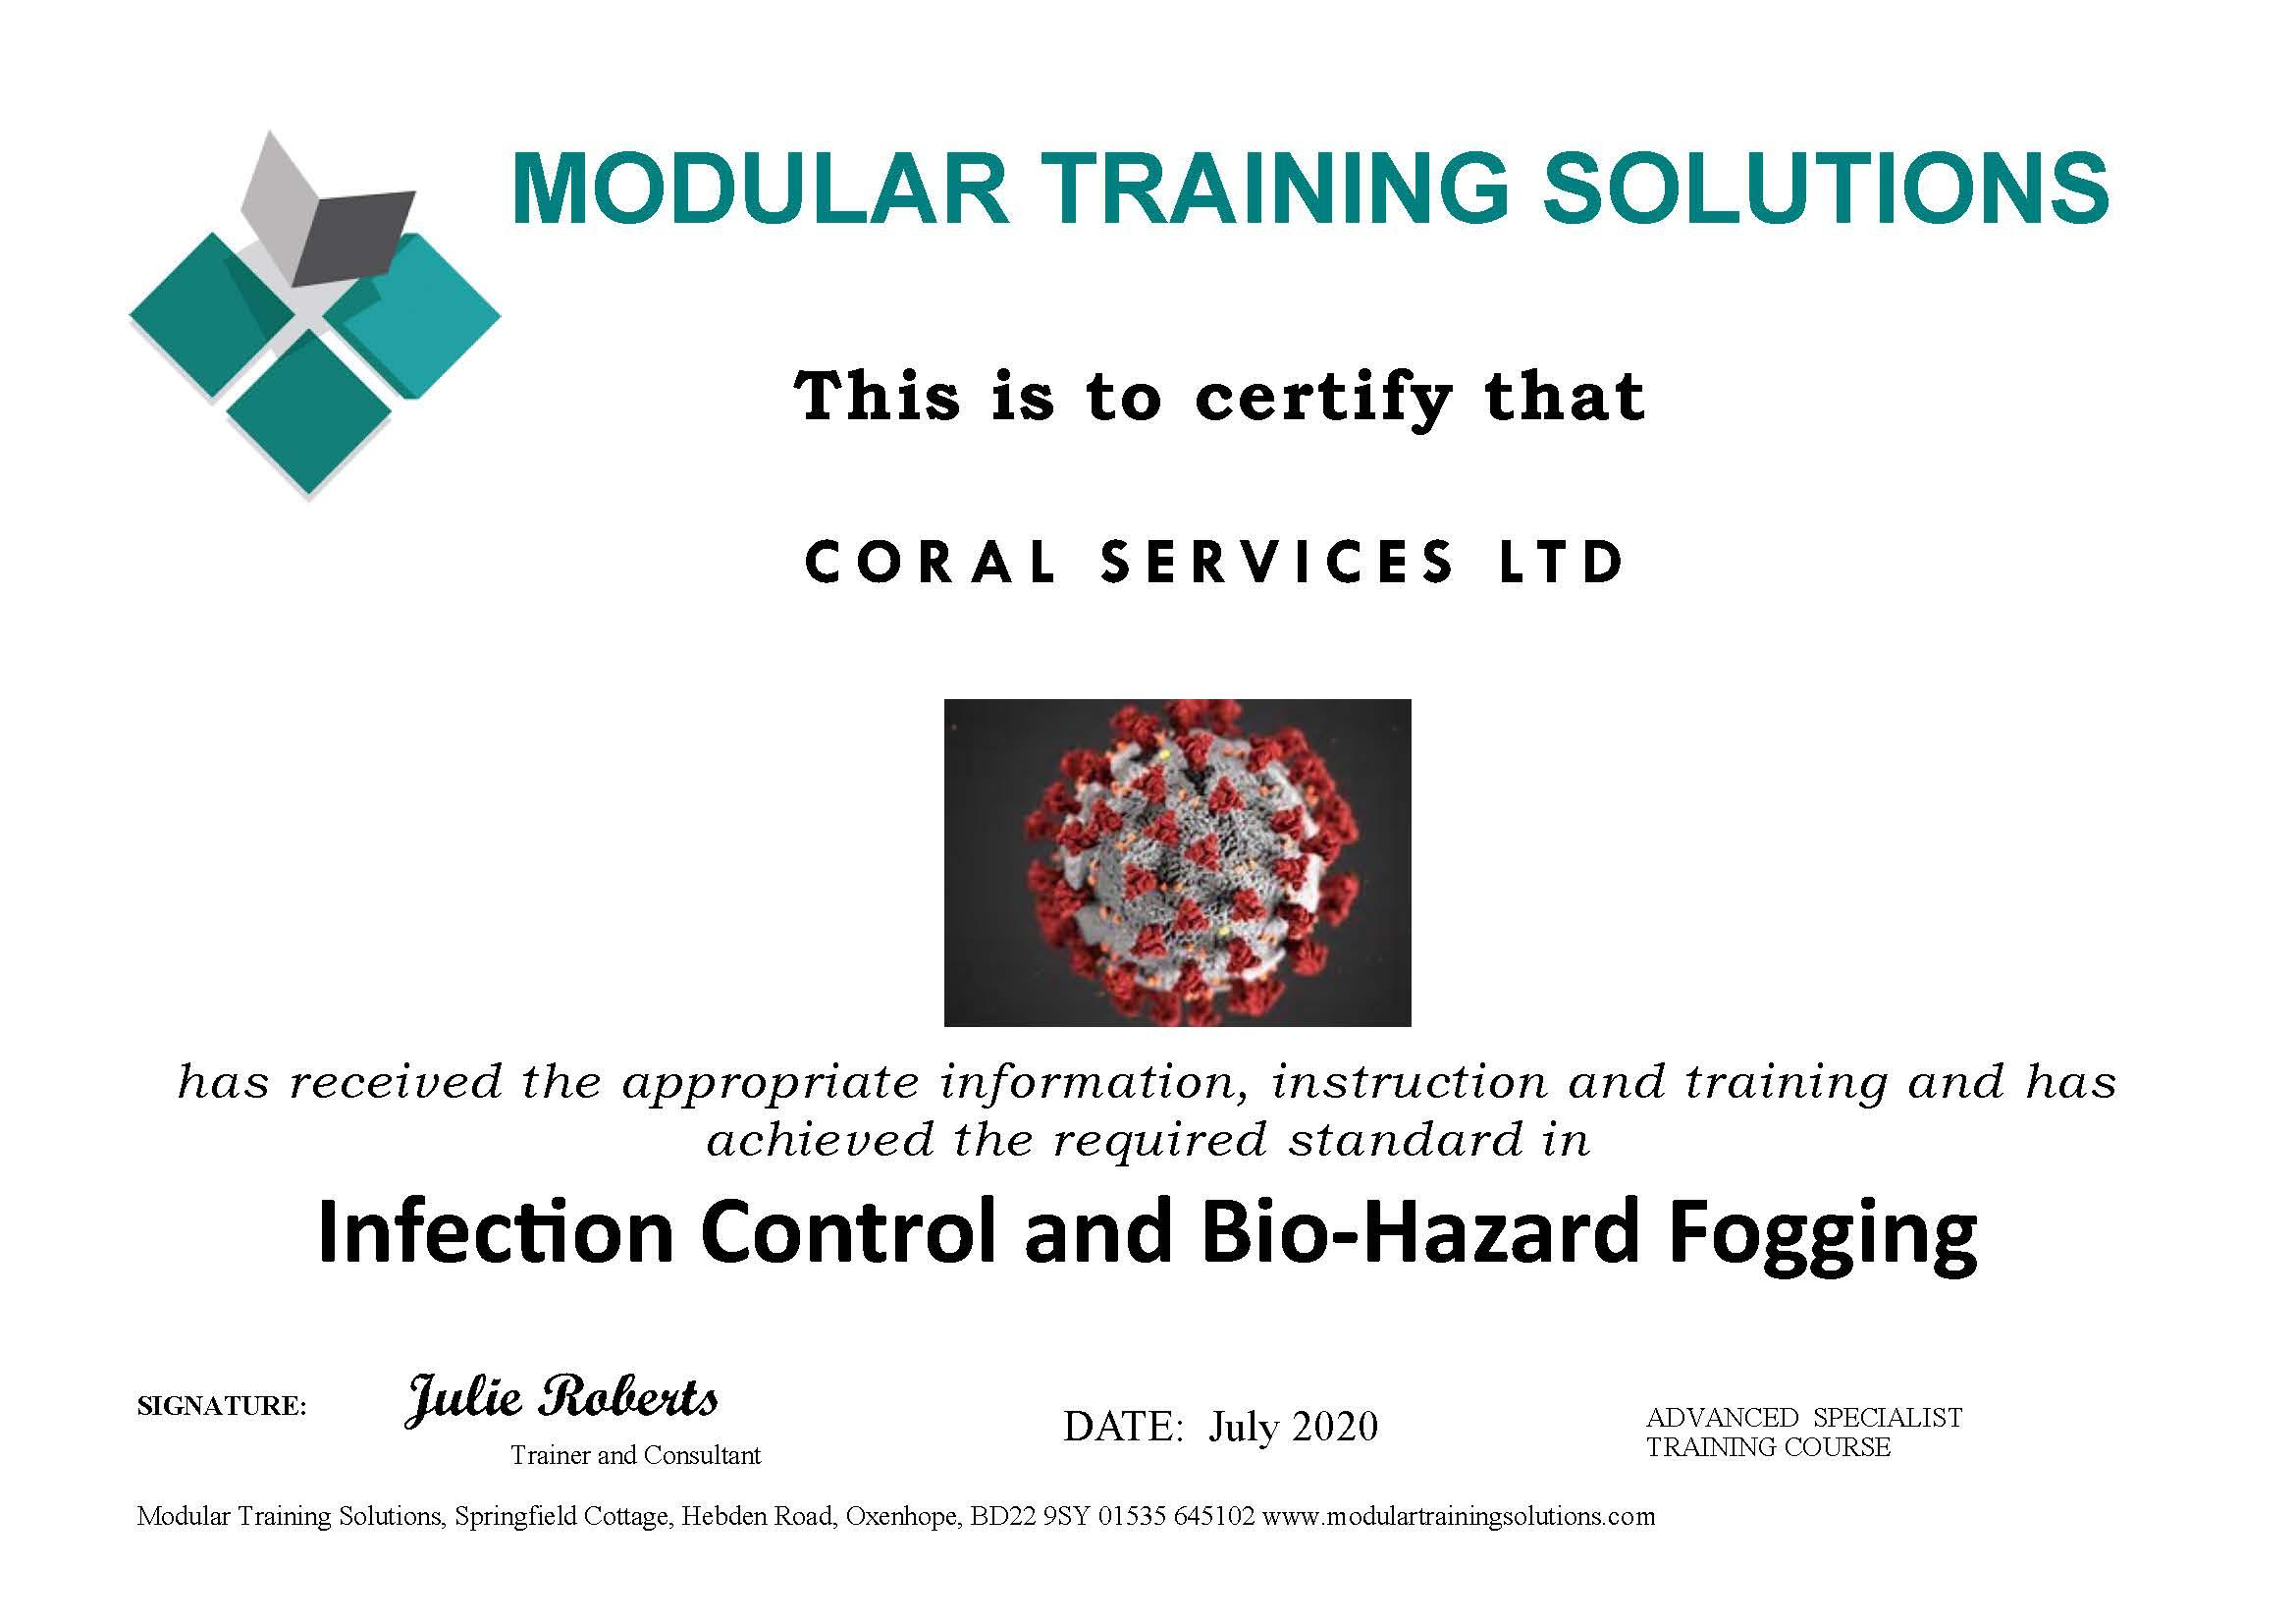 Disinfection Control and Bio-Hazard Fogging Certificate